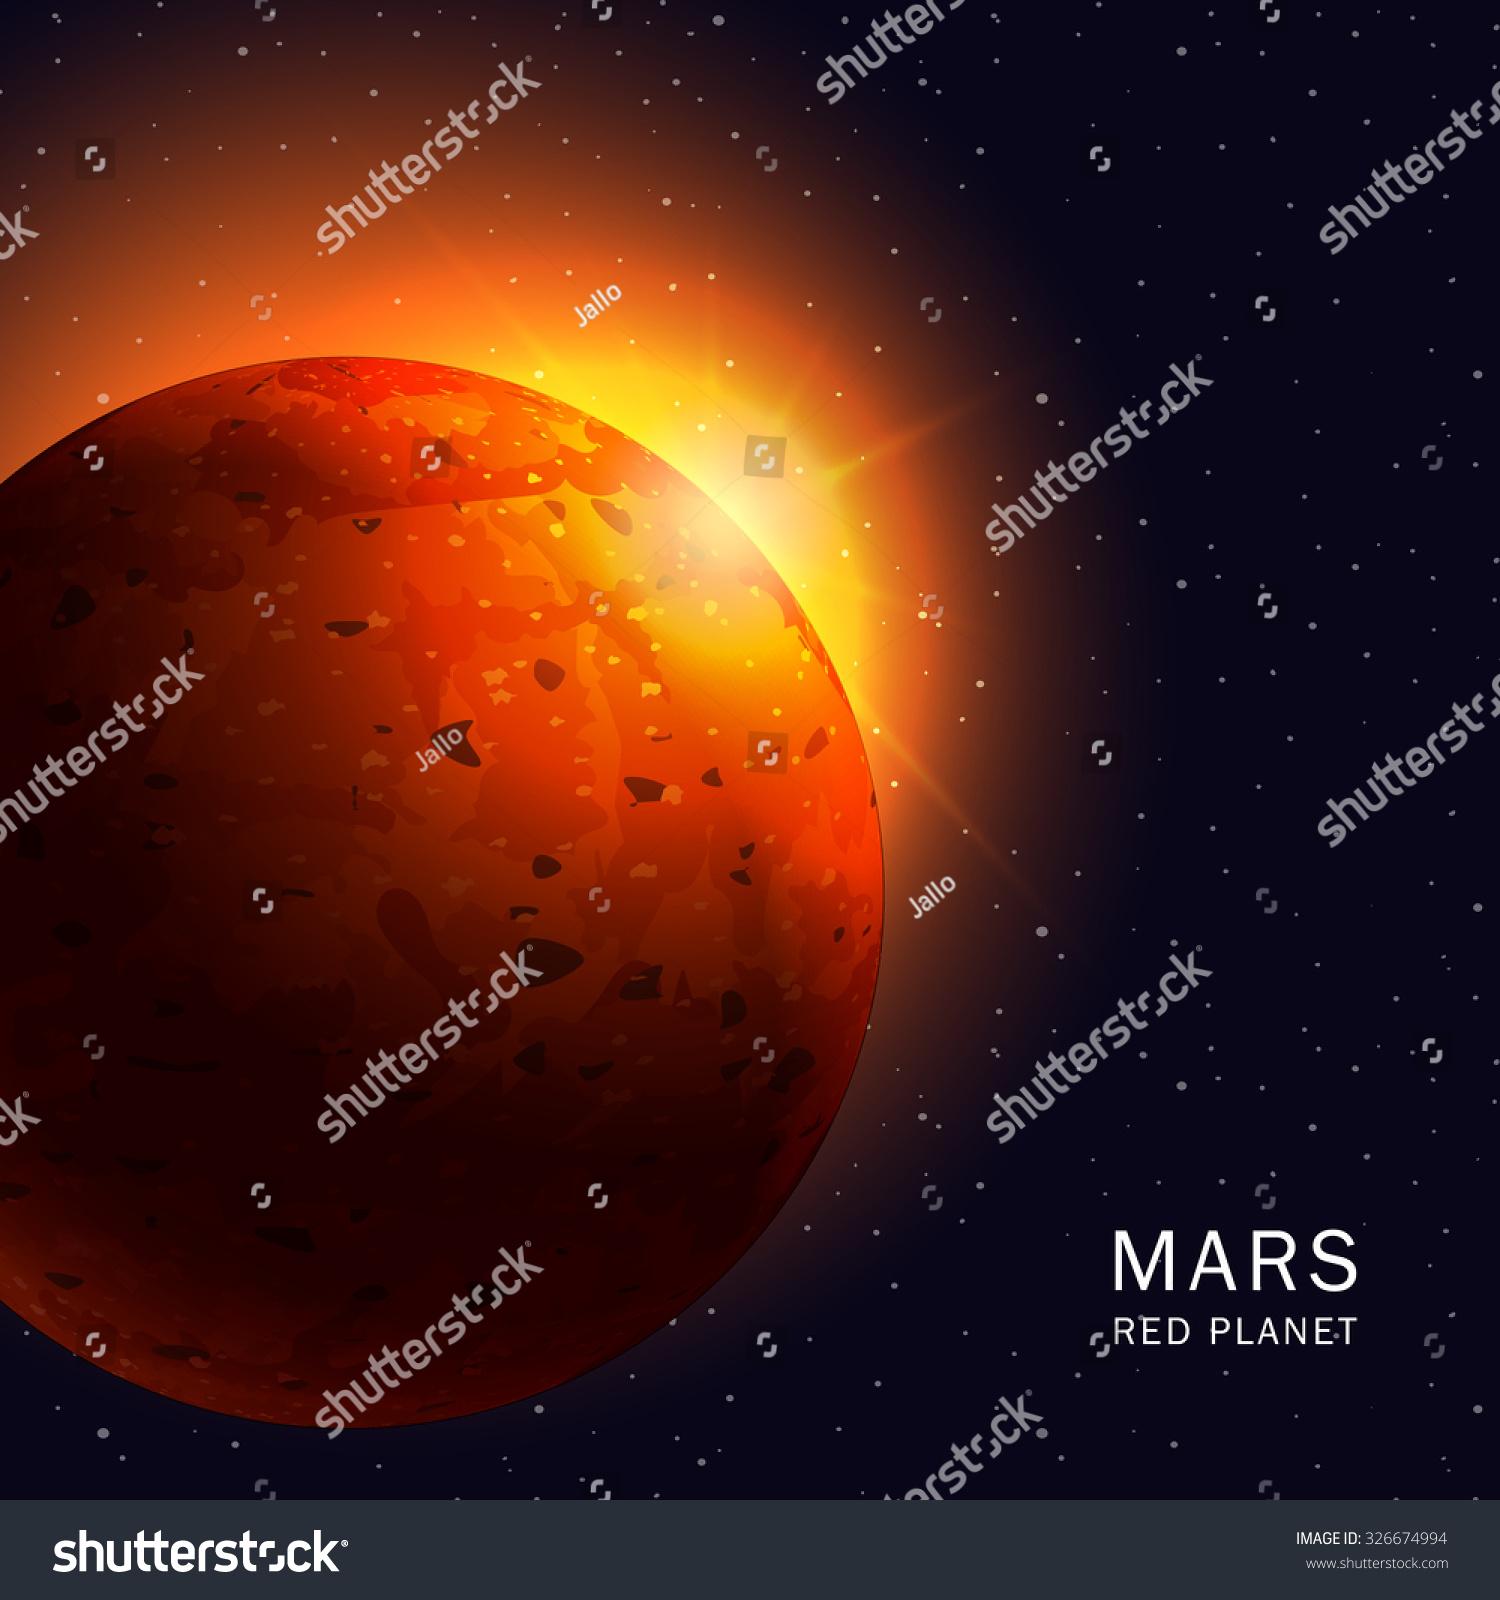 mars planet vector - photo #15